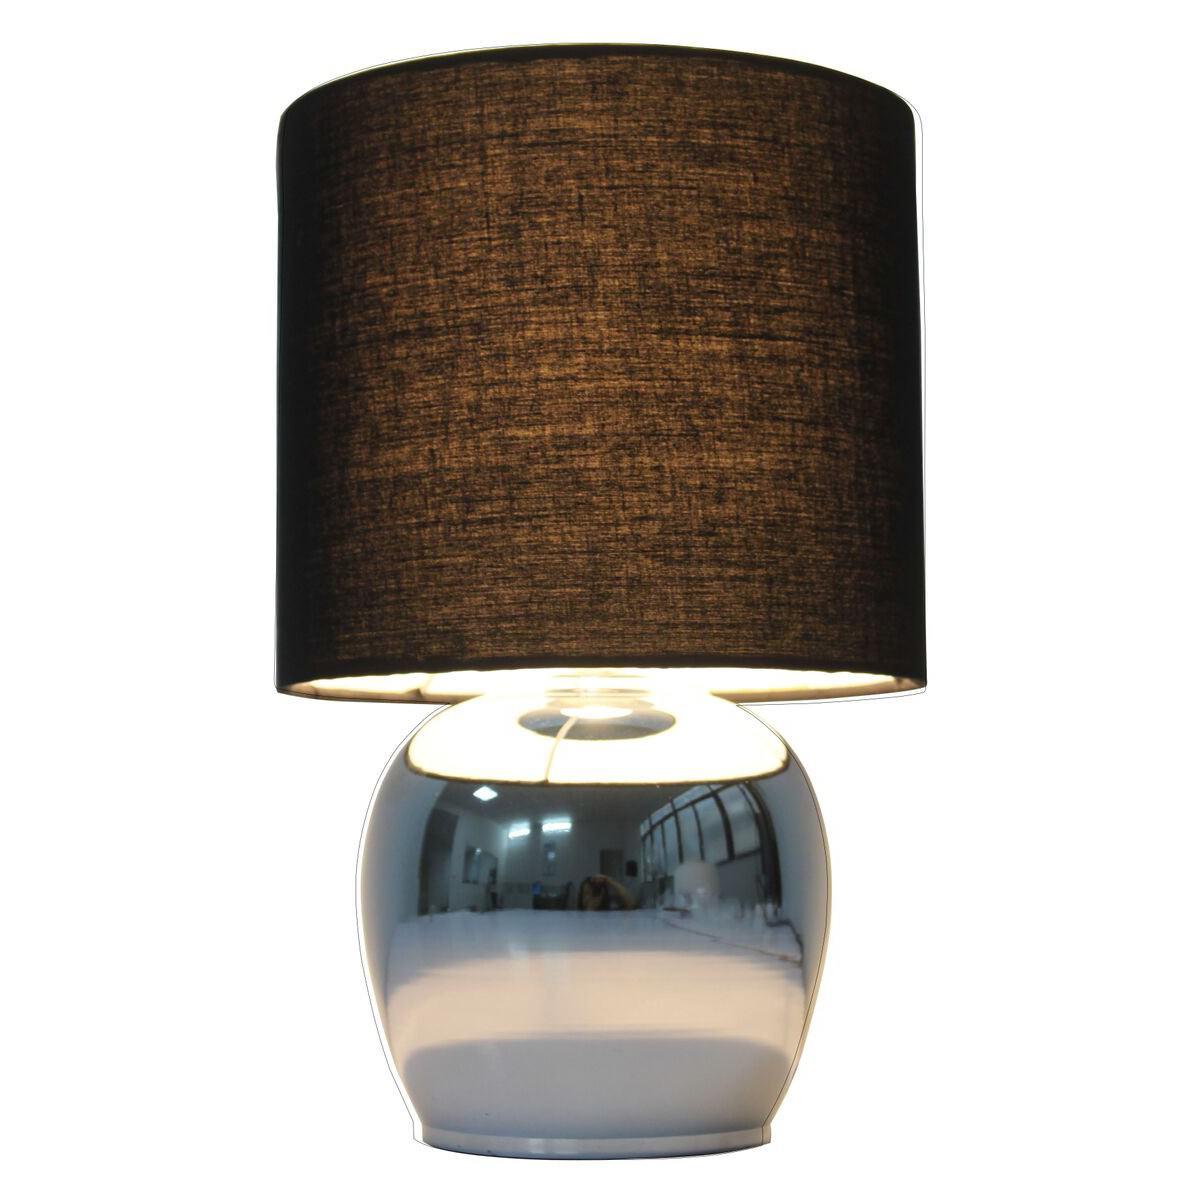 Corin Metal Base Touch Table Lamp, Black